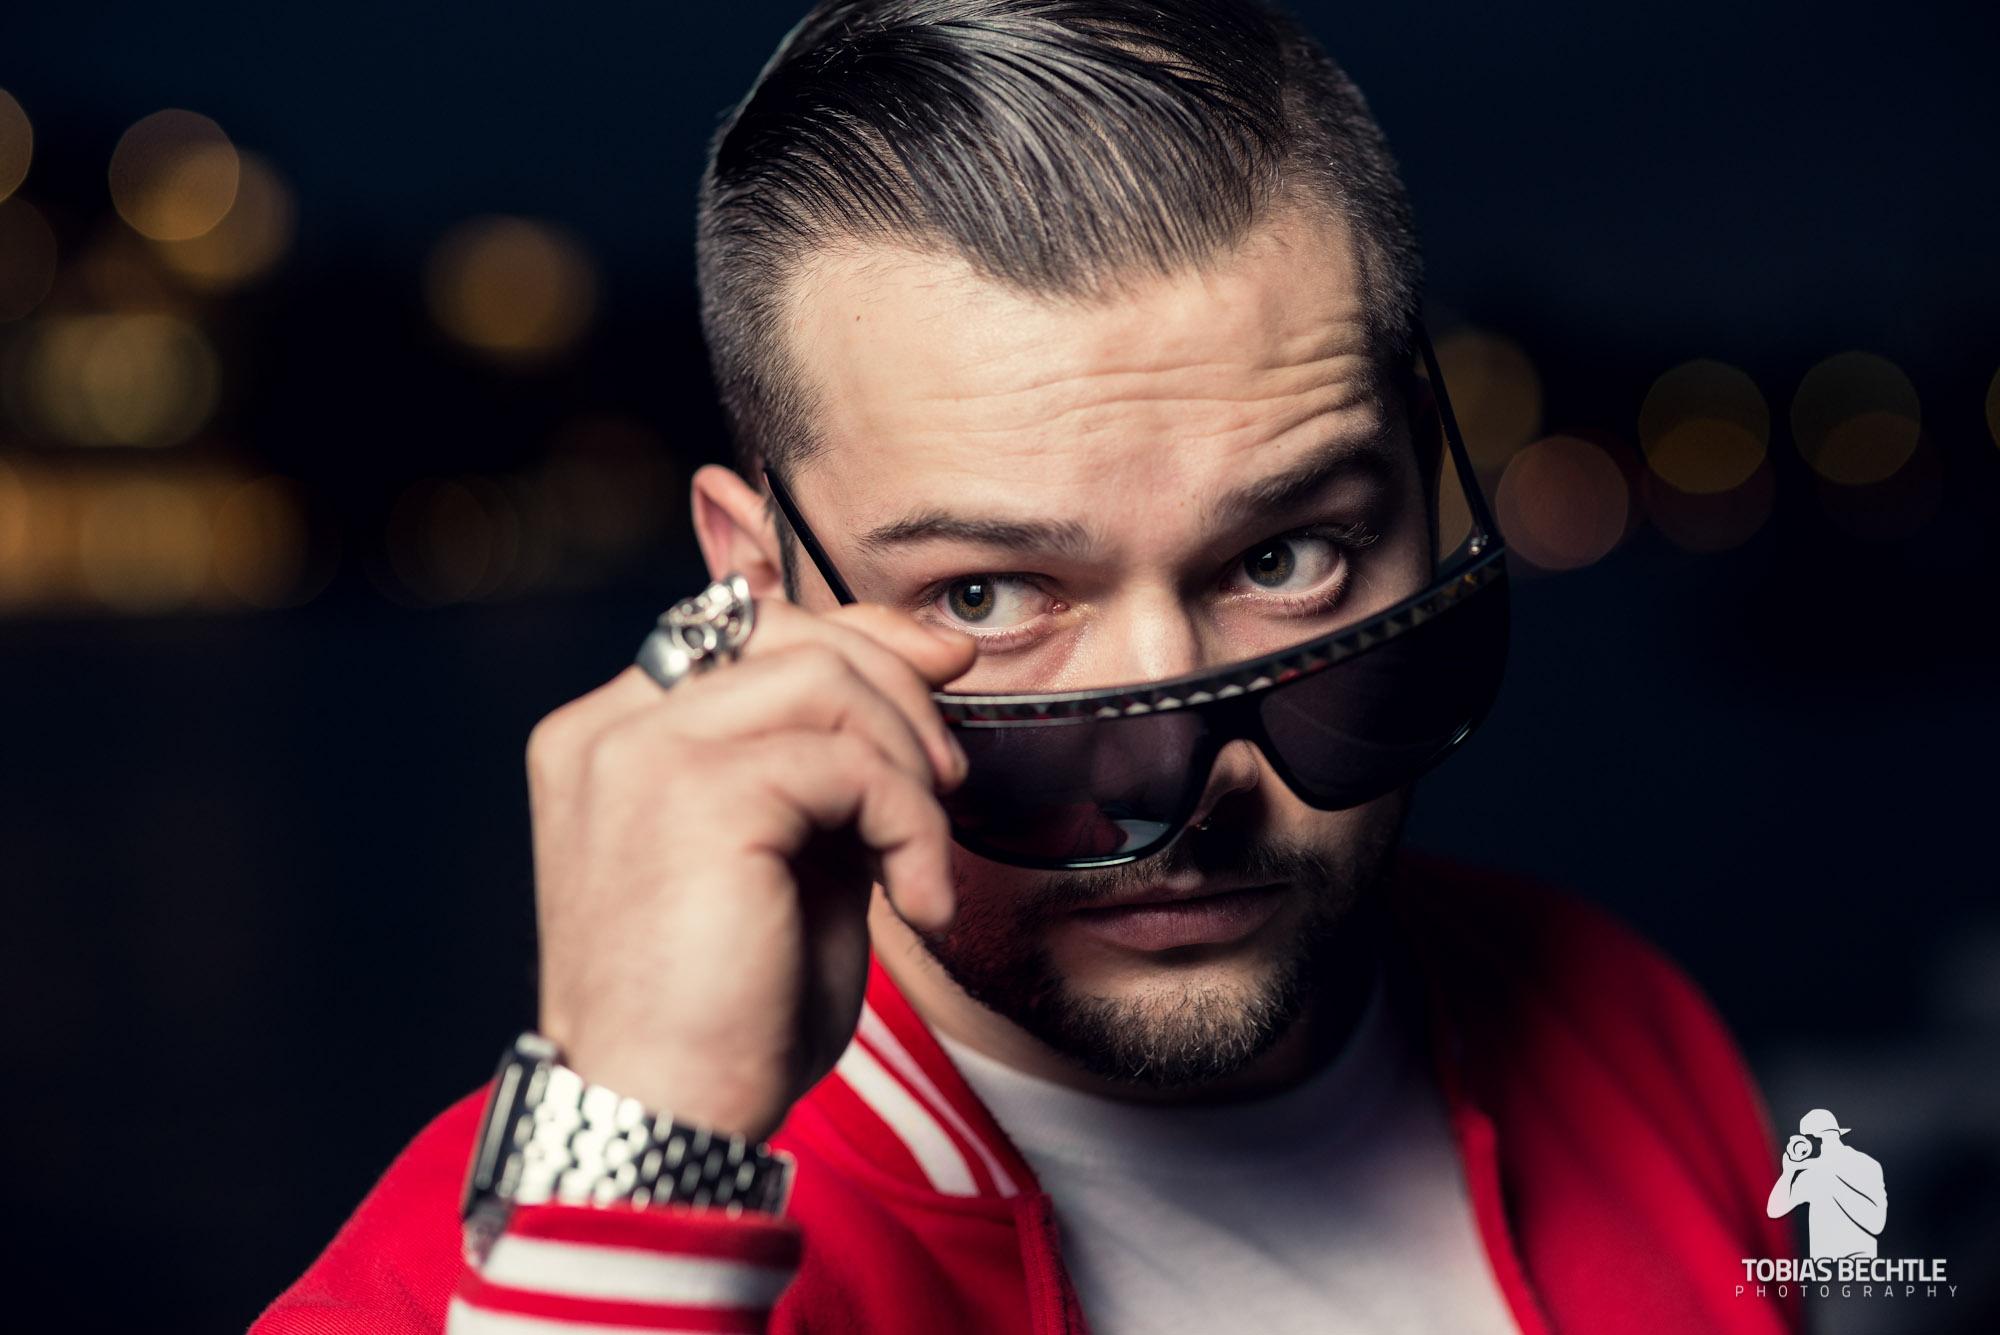 Niklas Portrait